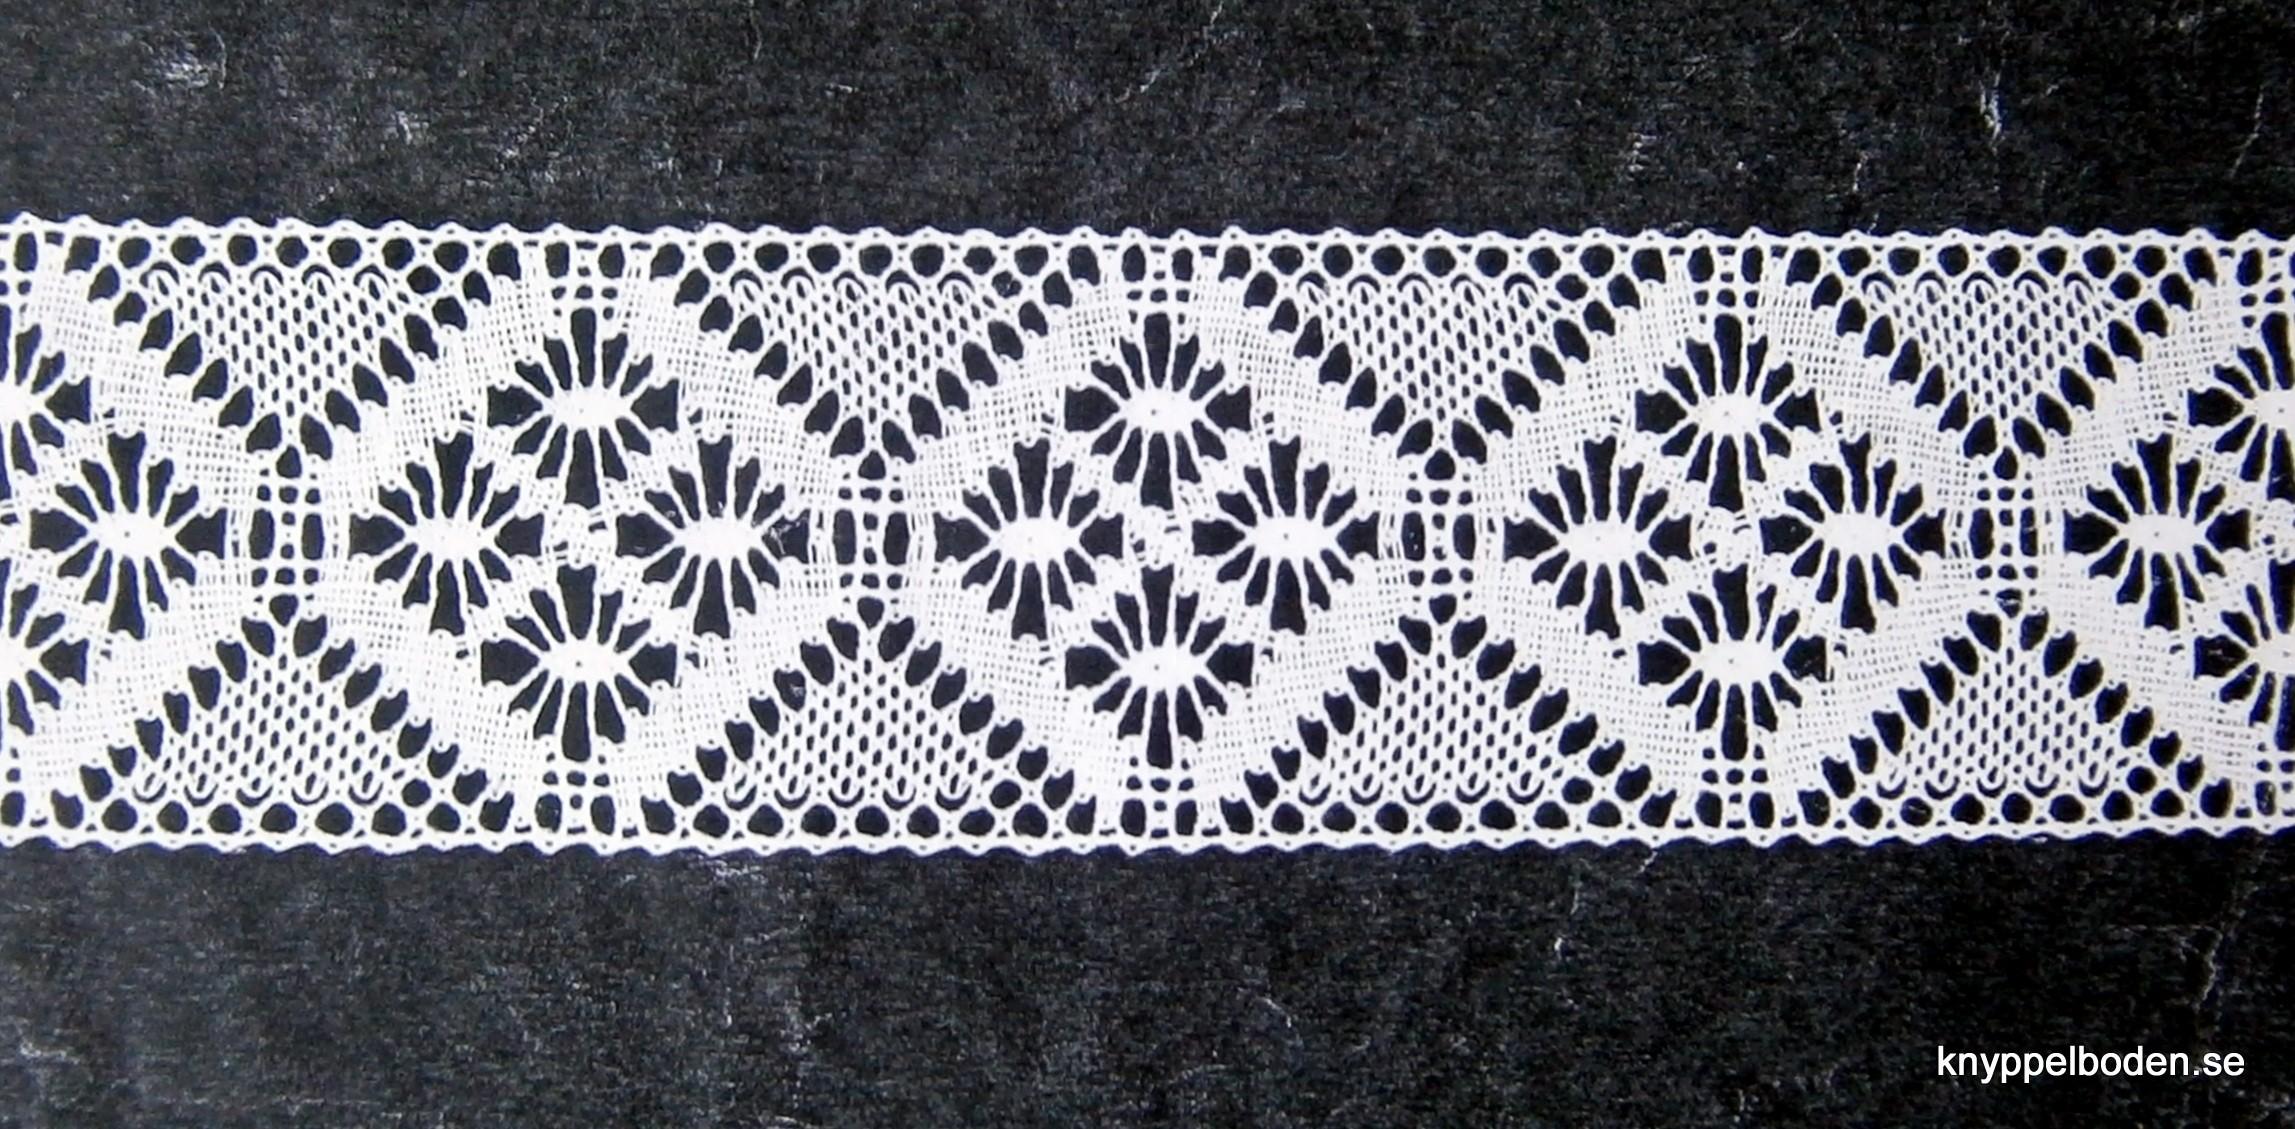 Mormors spets bredd 5 cm